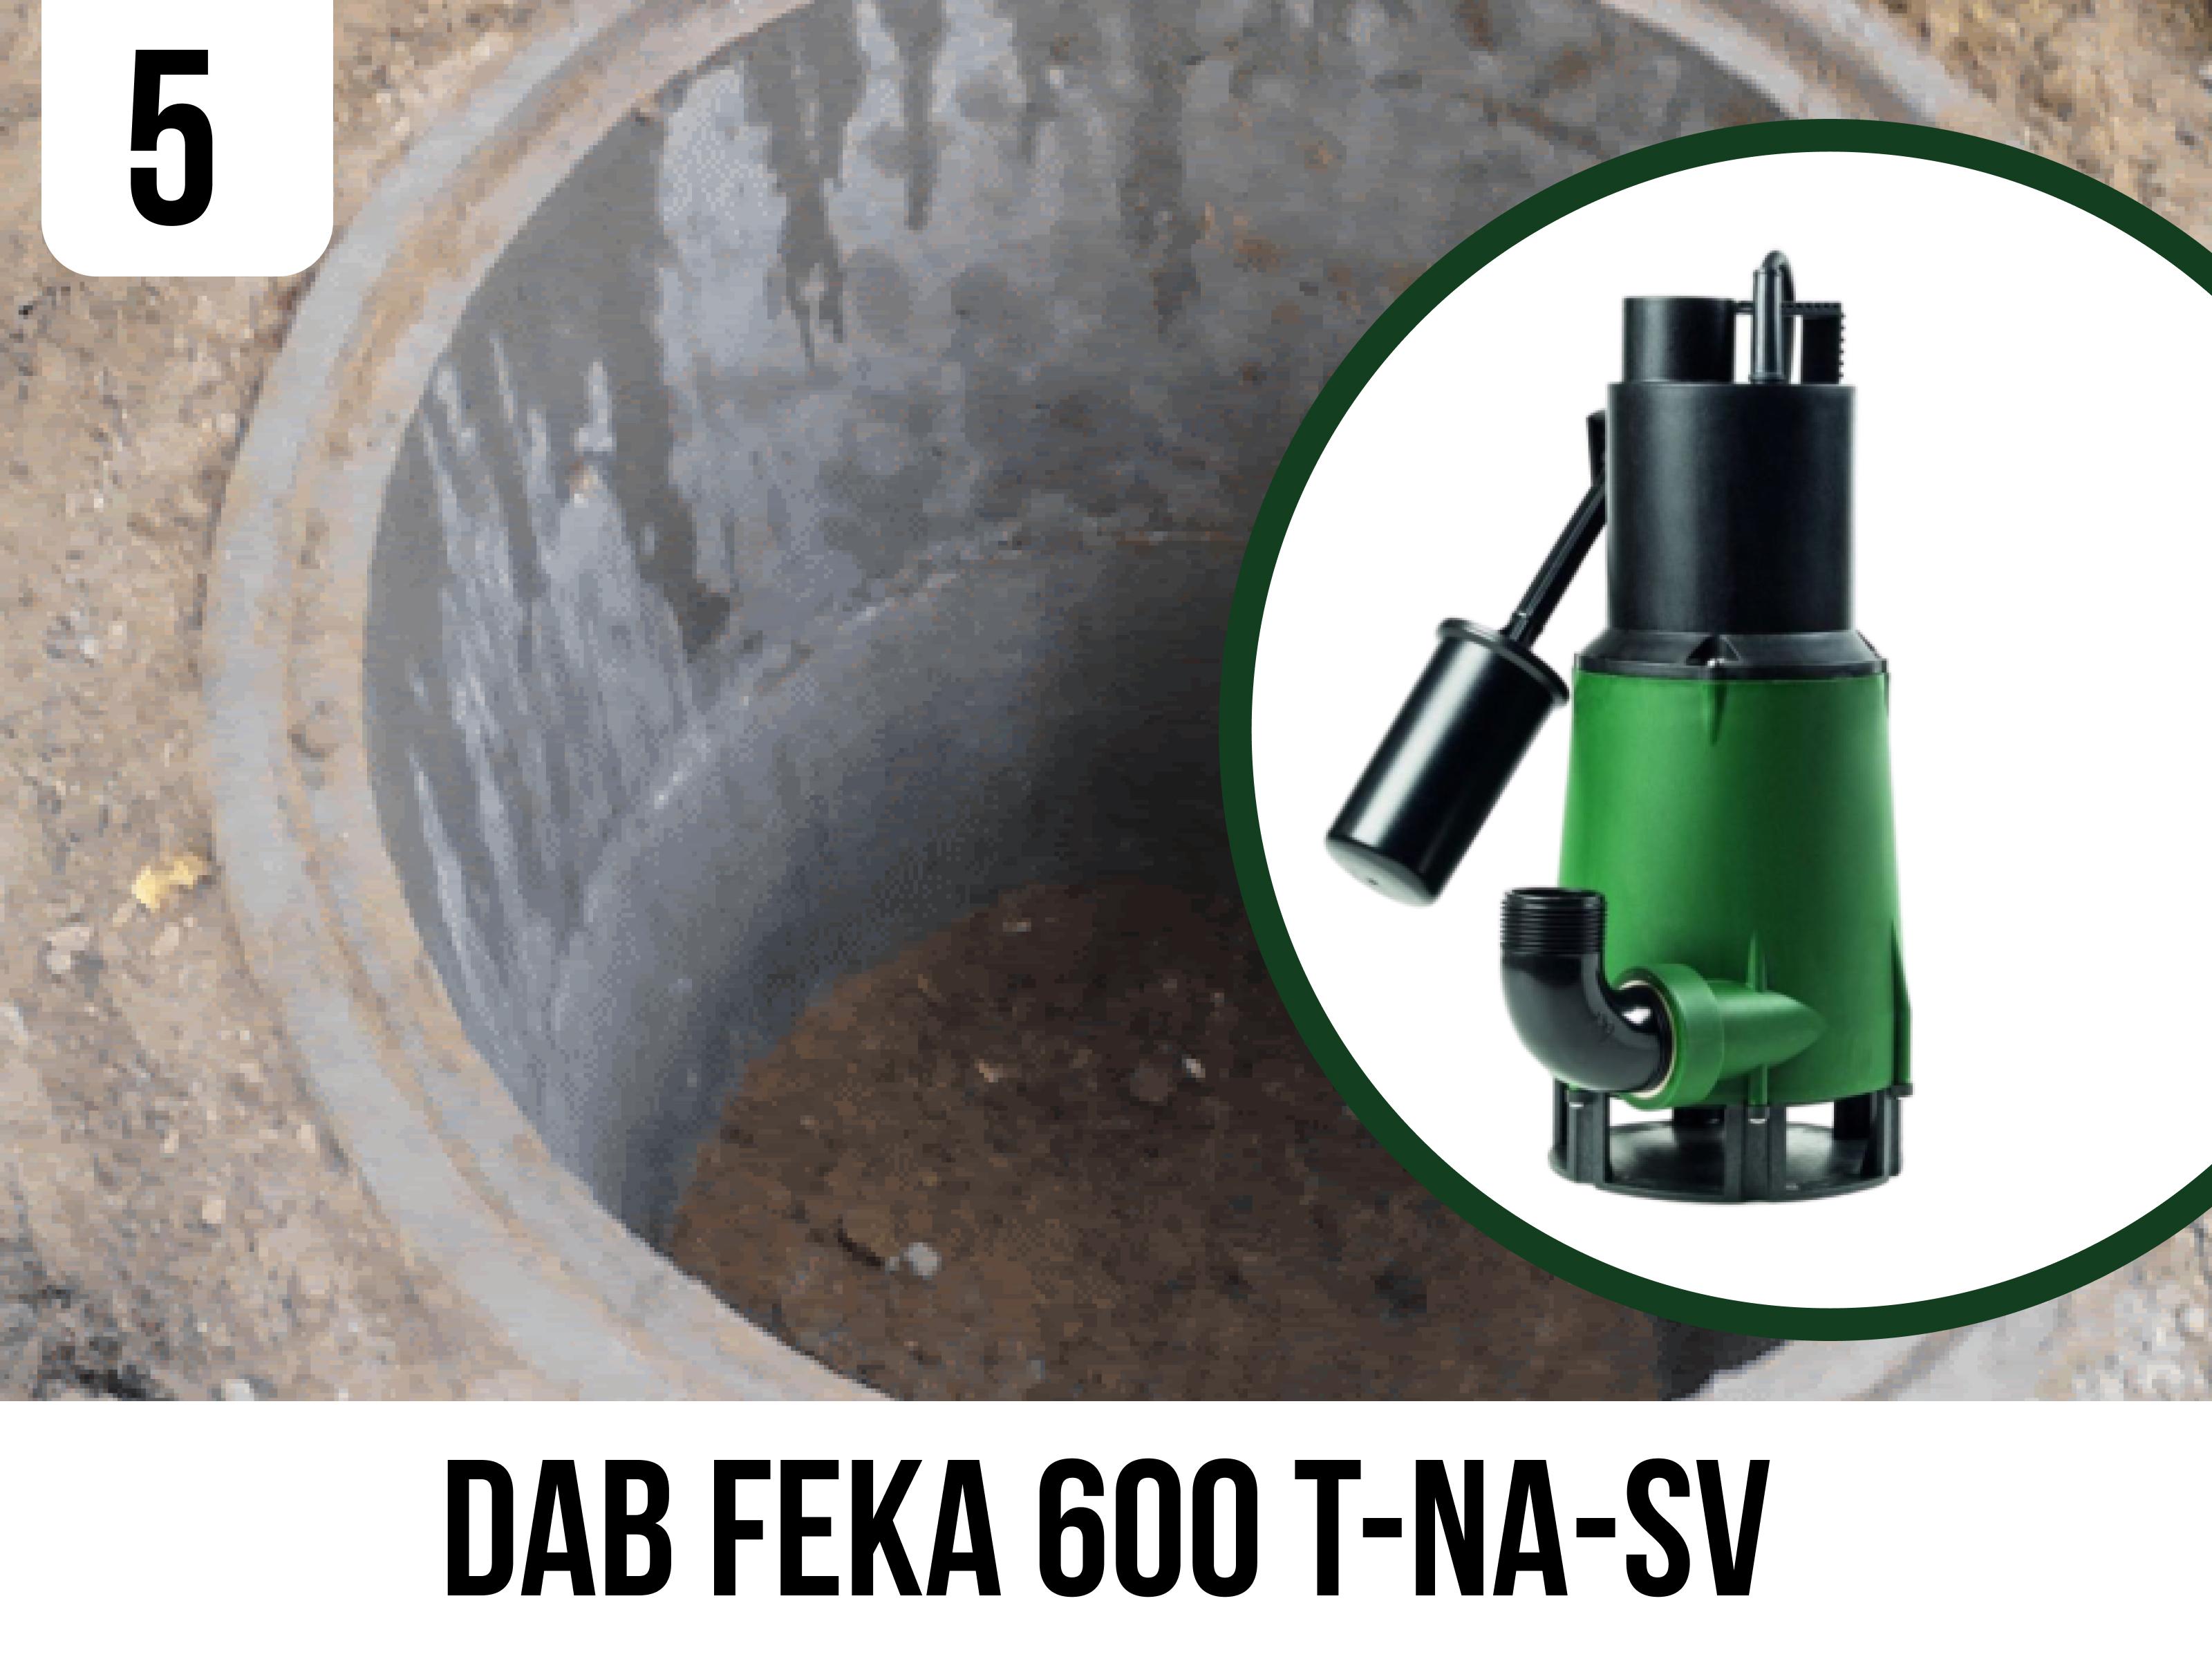 Фекальний насос DAB FEKA 600 T-NA-SV